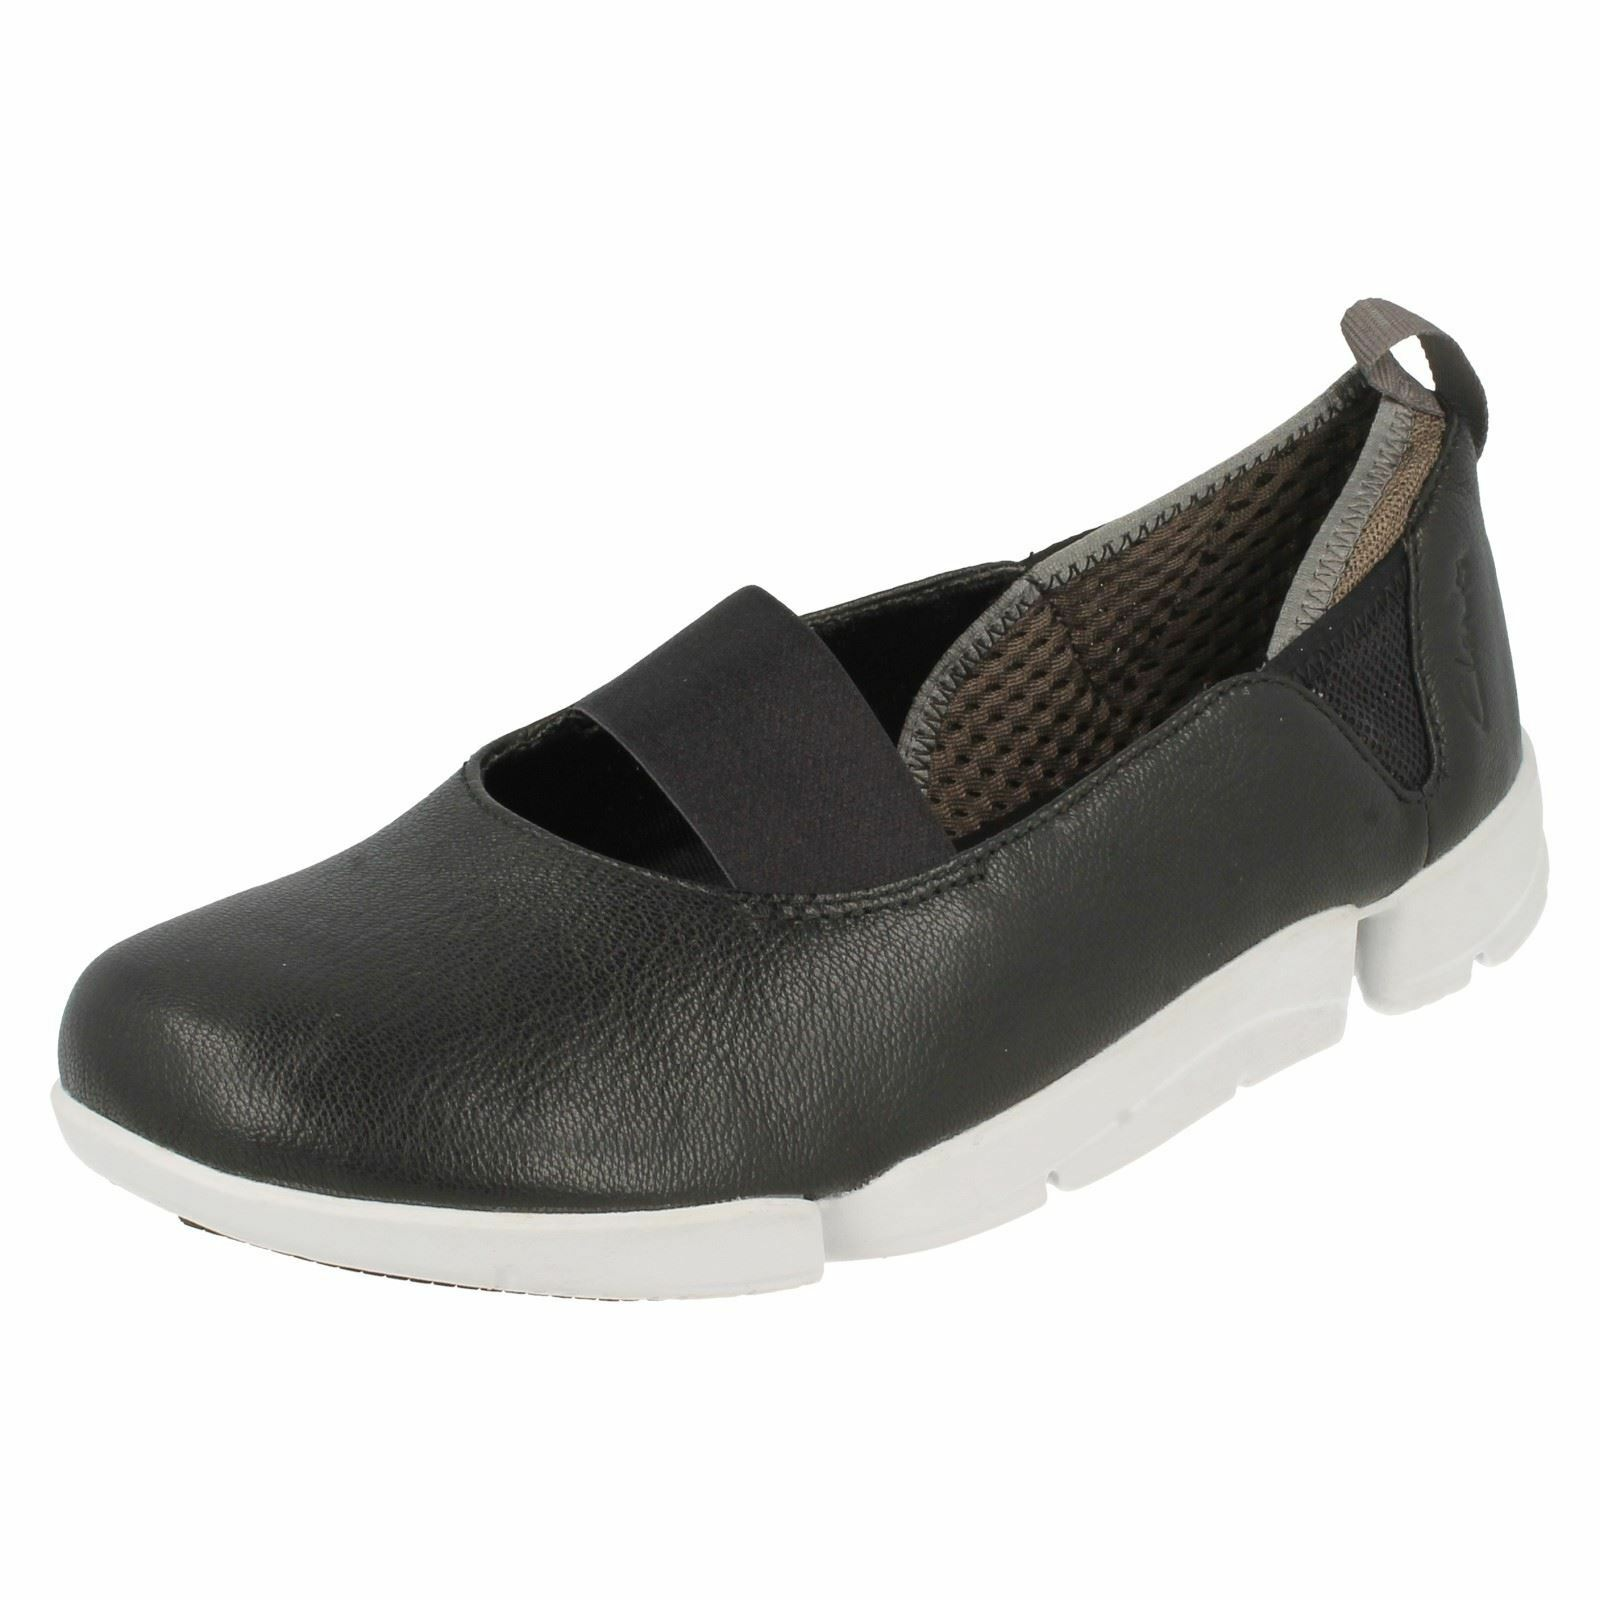 Damas Clarks Zapatos Informales Informales Informales Tri paso  tiendas minoristas